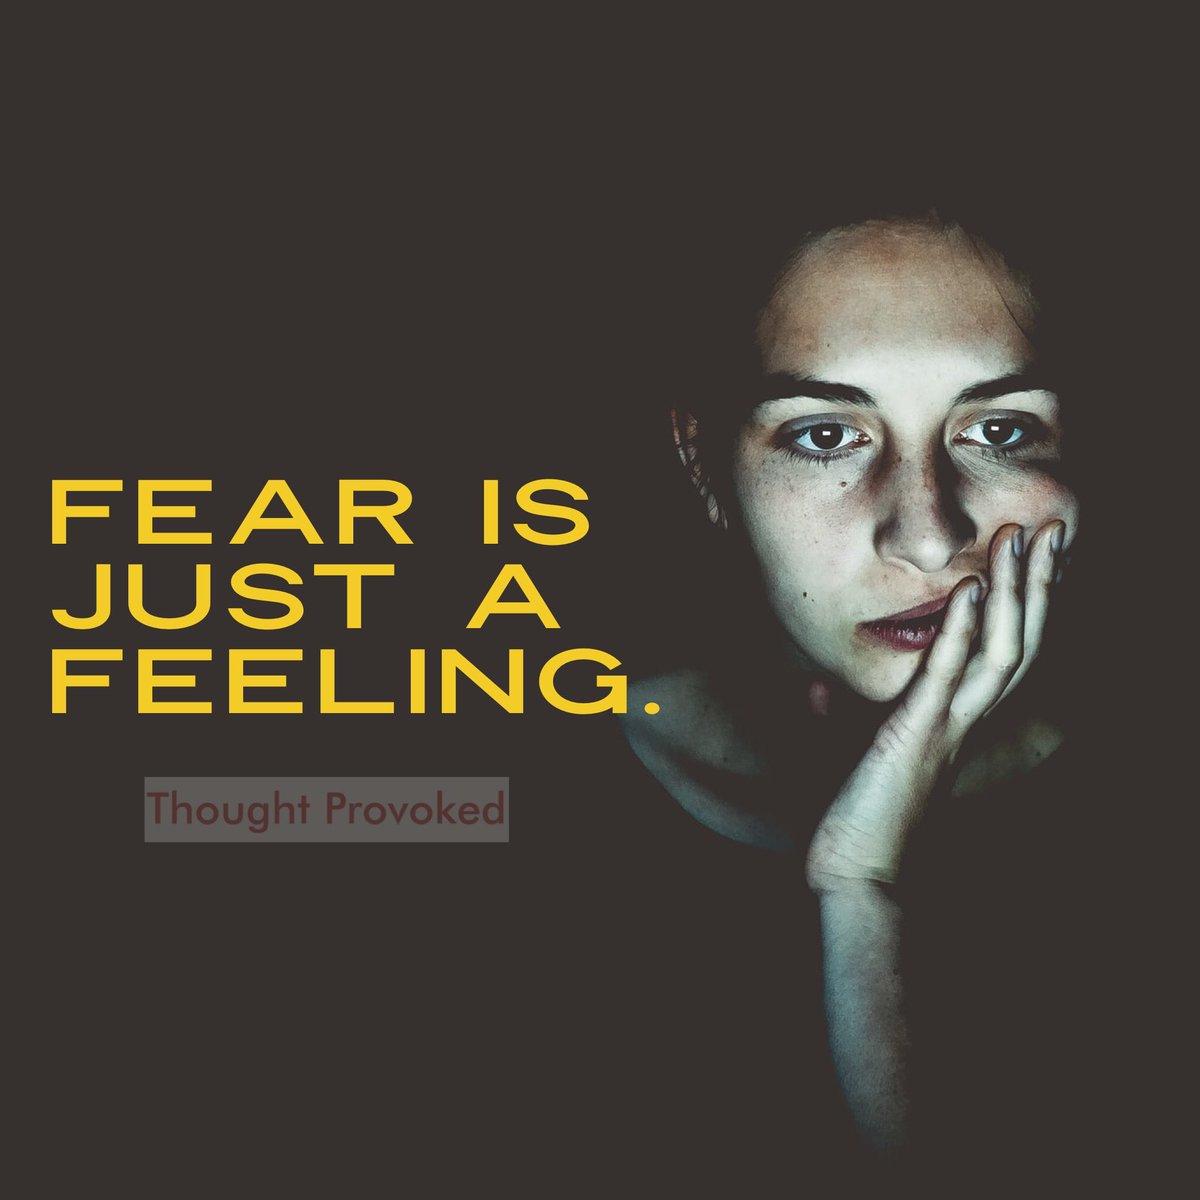 Fear is just a feeling. #SaturdayMotivation #IQRTG #SaturdayMorning #Fear #Motivation #SaturdayVibes